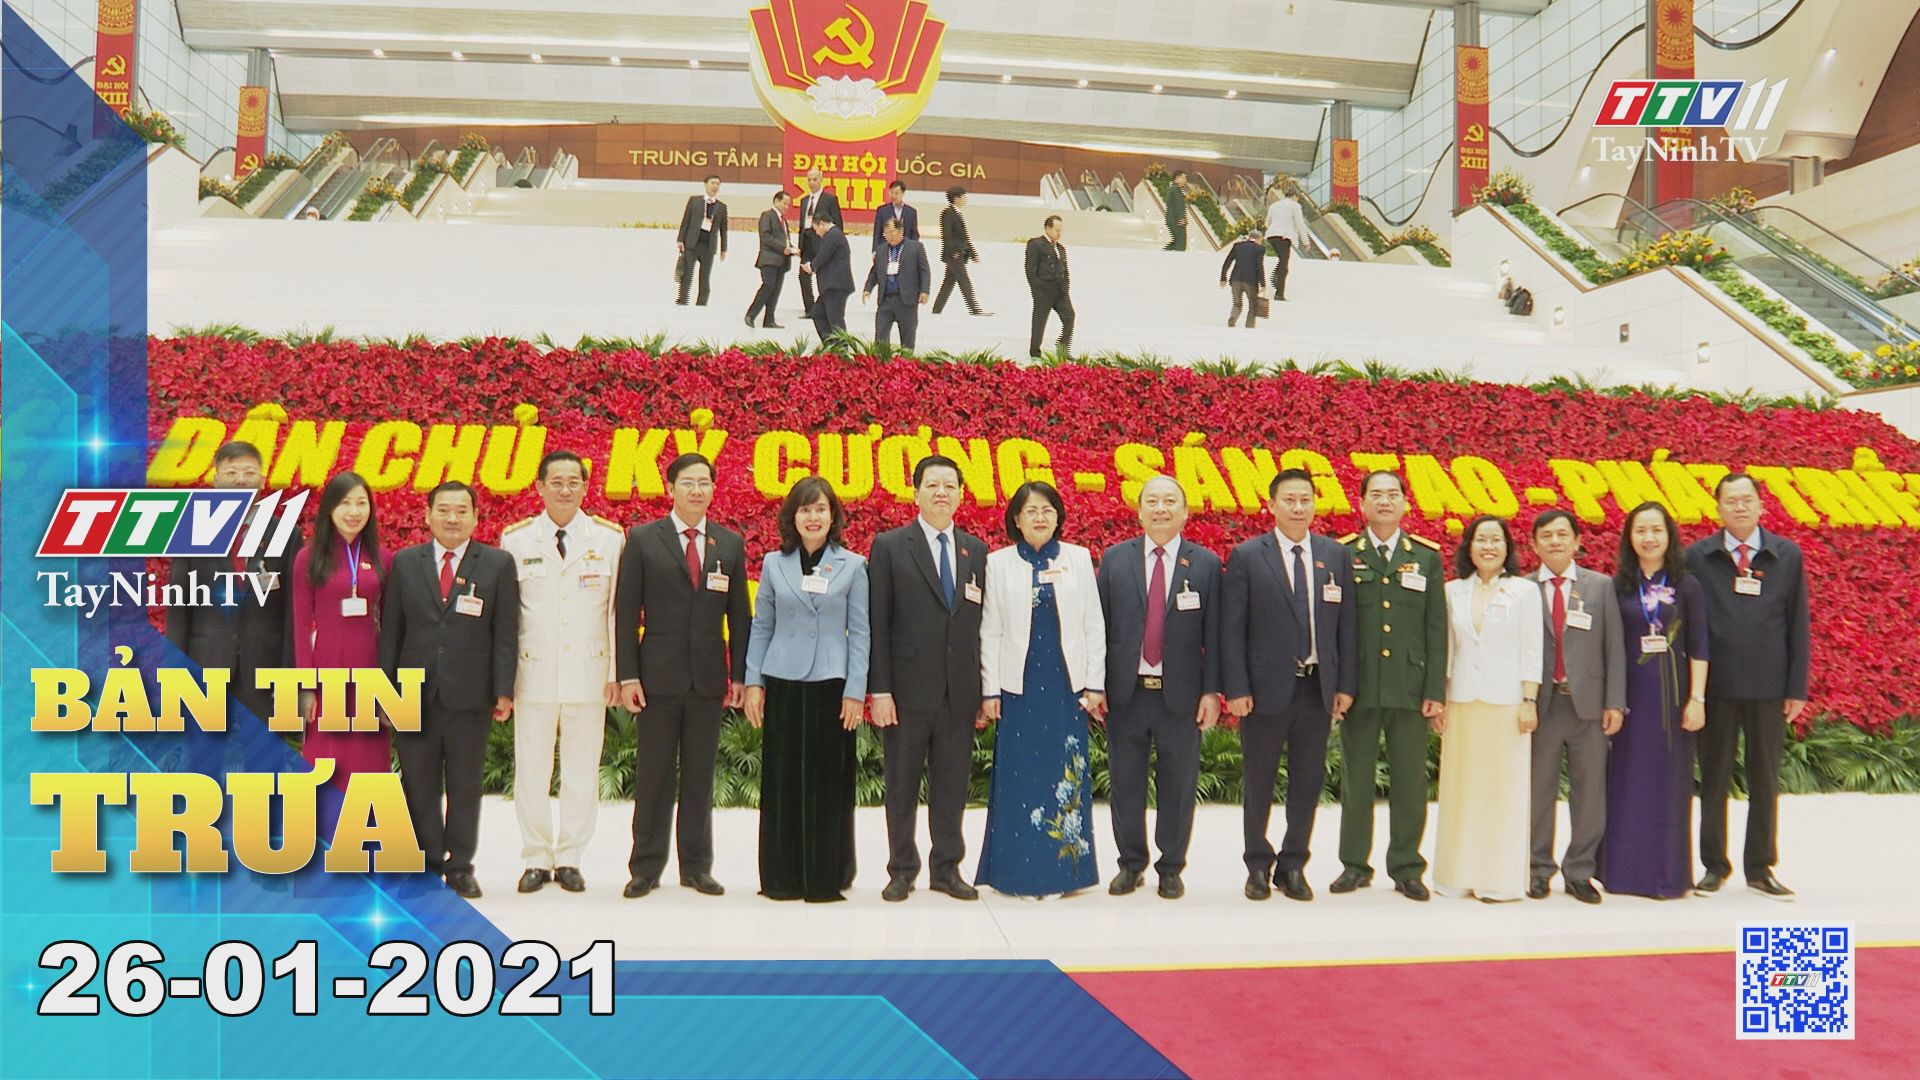 Bản tin trưa 26-01-2021 | Tin tức hôm nay | TayNinhTV